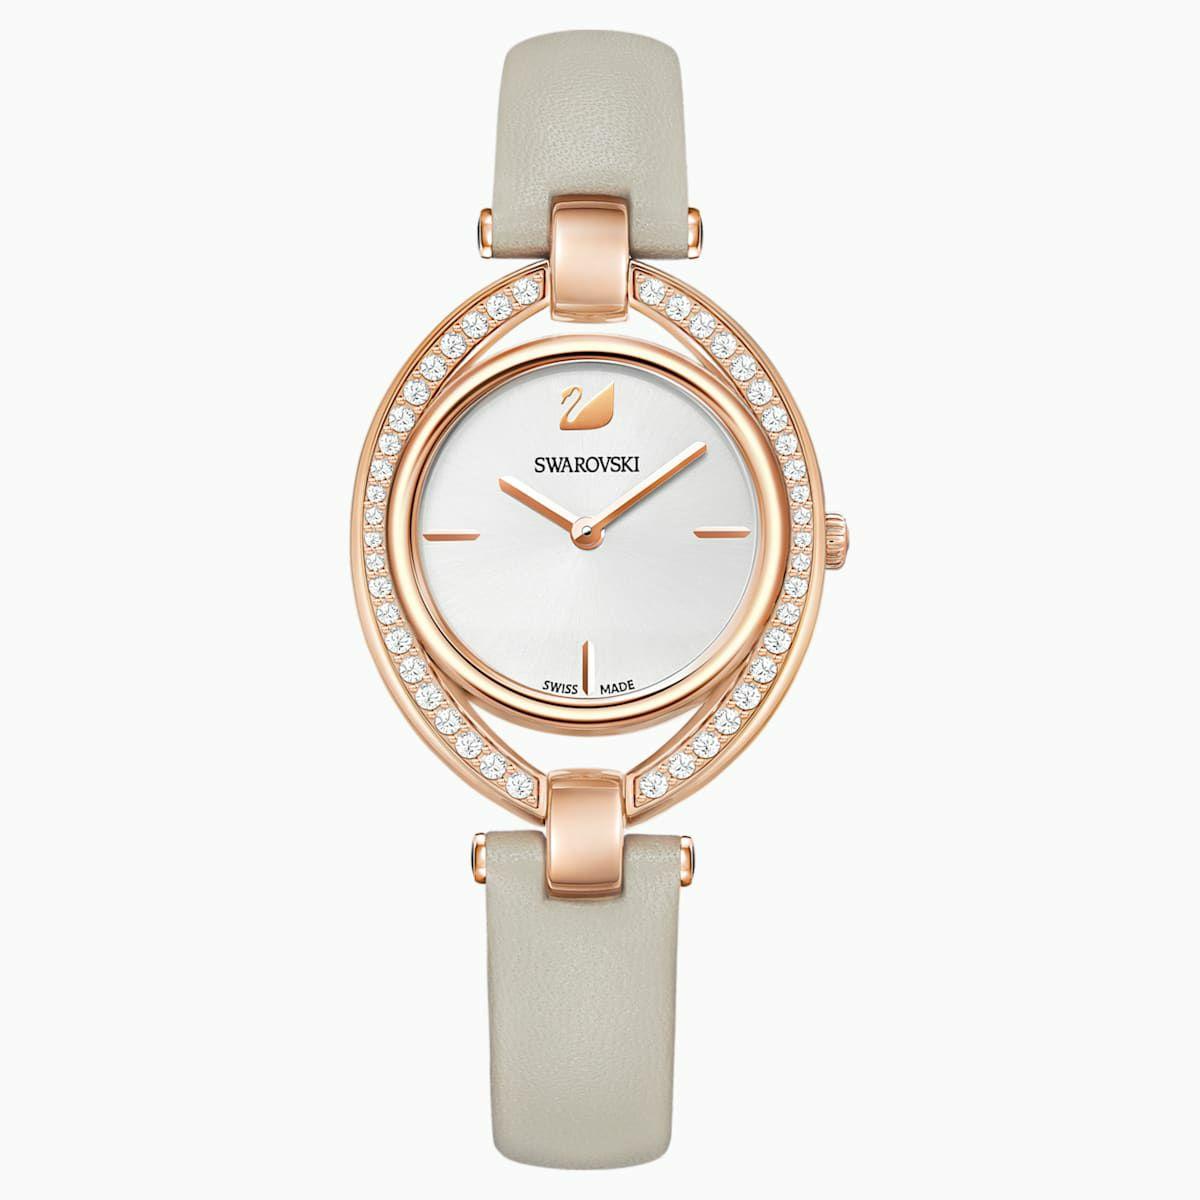 Montre Swarovski Stella pour Femme - Bracelet en cuir, gris, pvd dorée rose